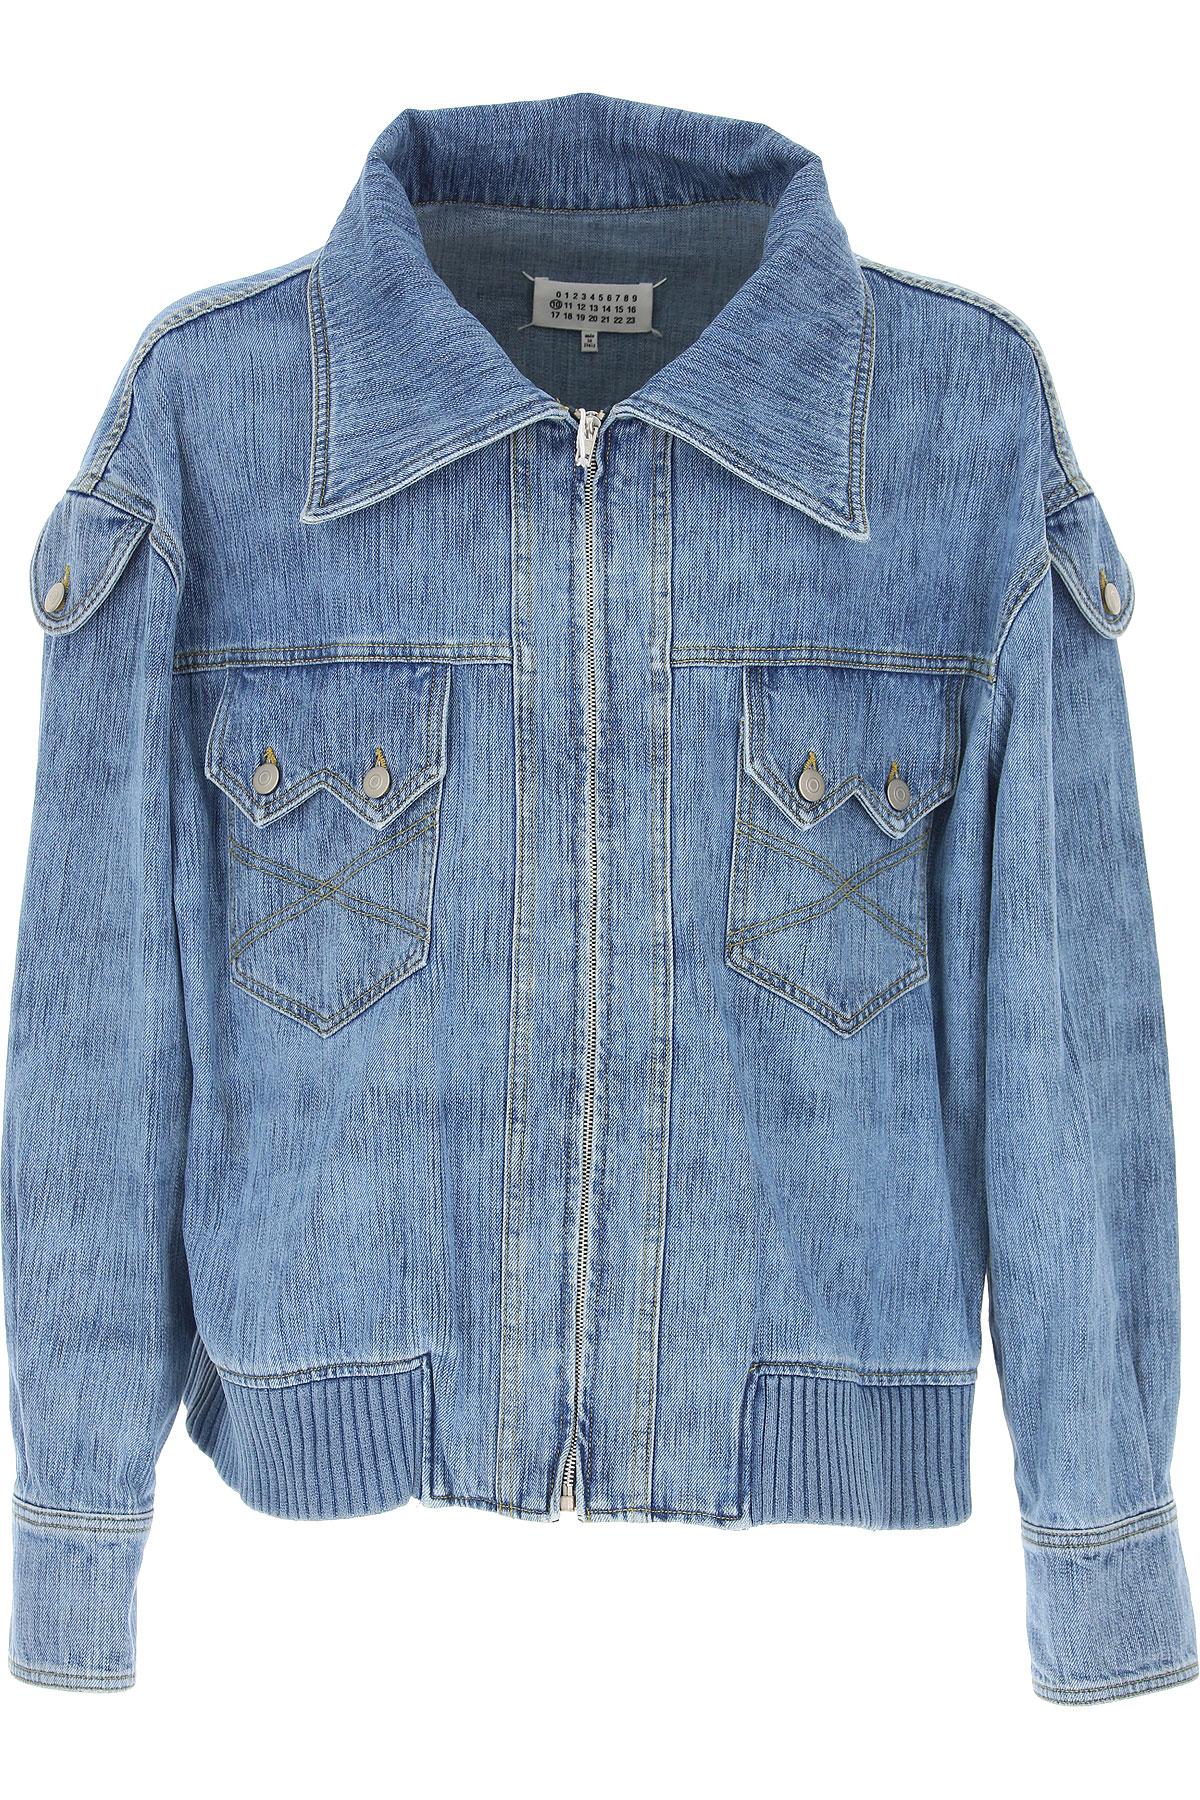 Maison Martin Margiela Jacket for Men On Sale in Outlet, Indigo, Cotton, 2019, M S